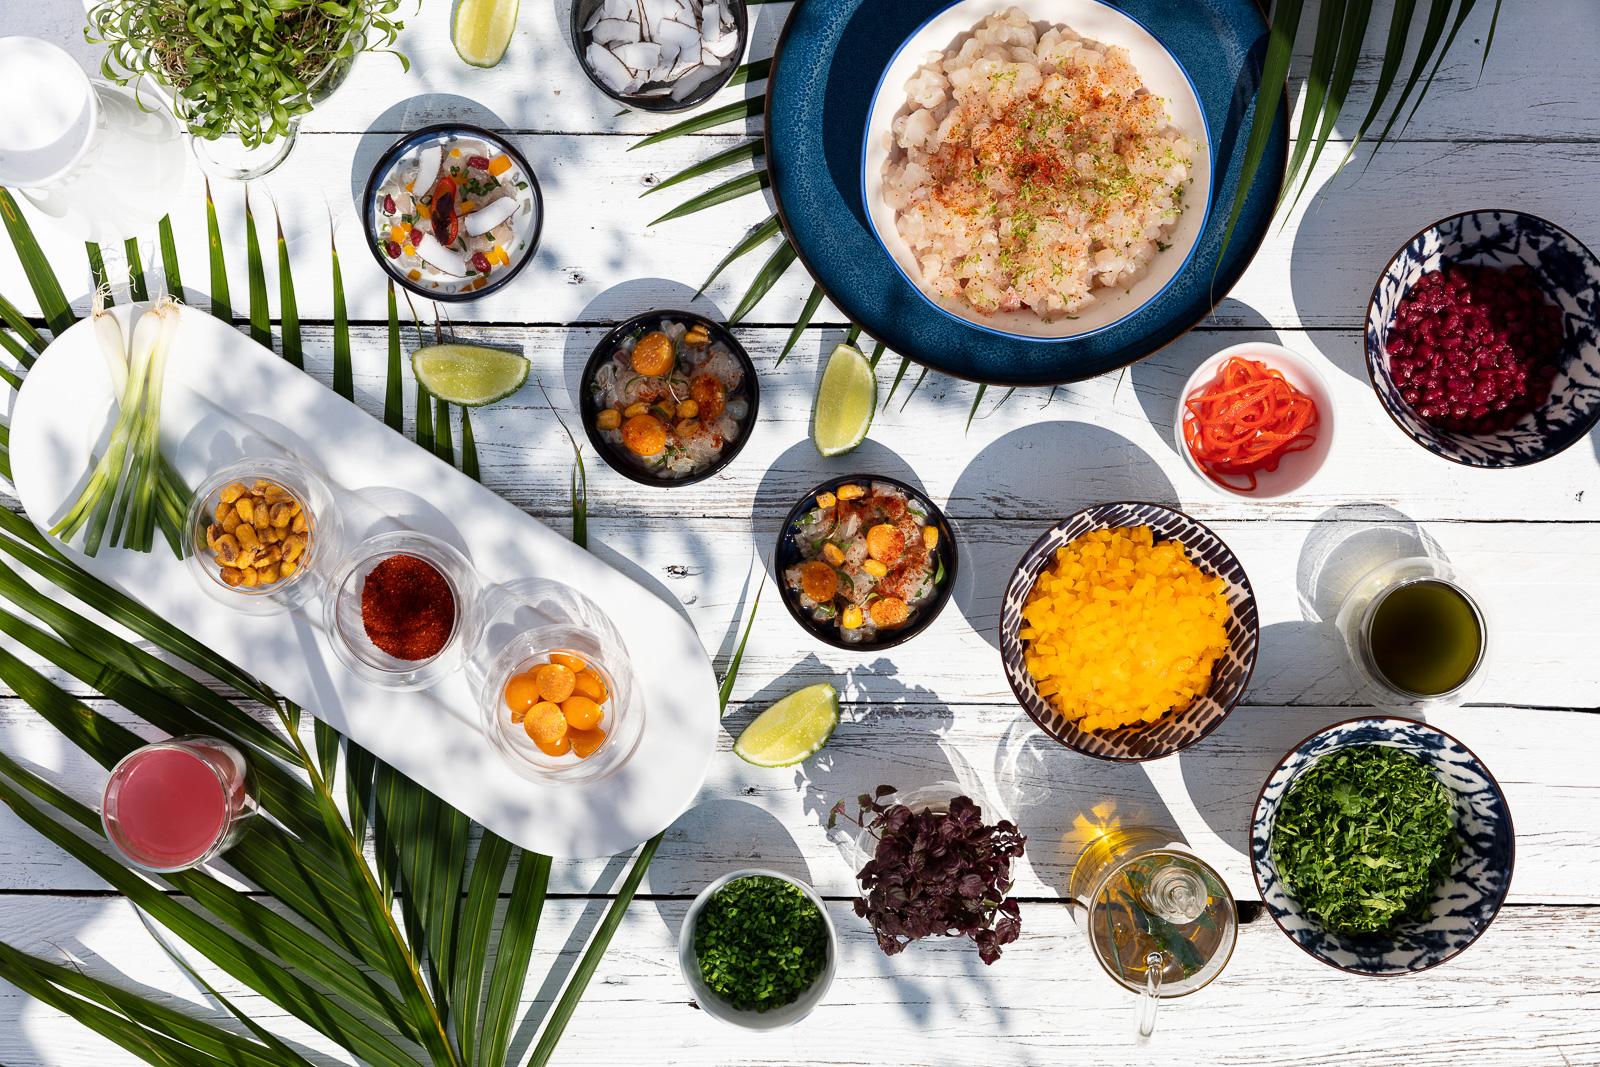 Franck_Hamel_food_photographer_photographeculinaire_valerie_paumelle_agent_st_clair_traiteur (13).jpg